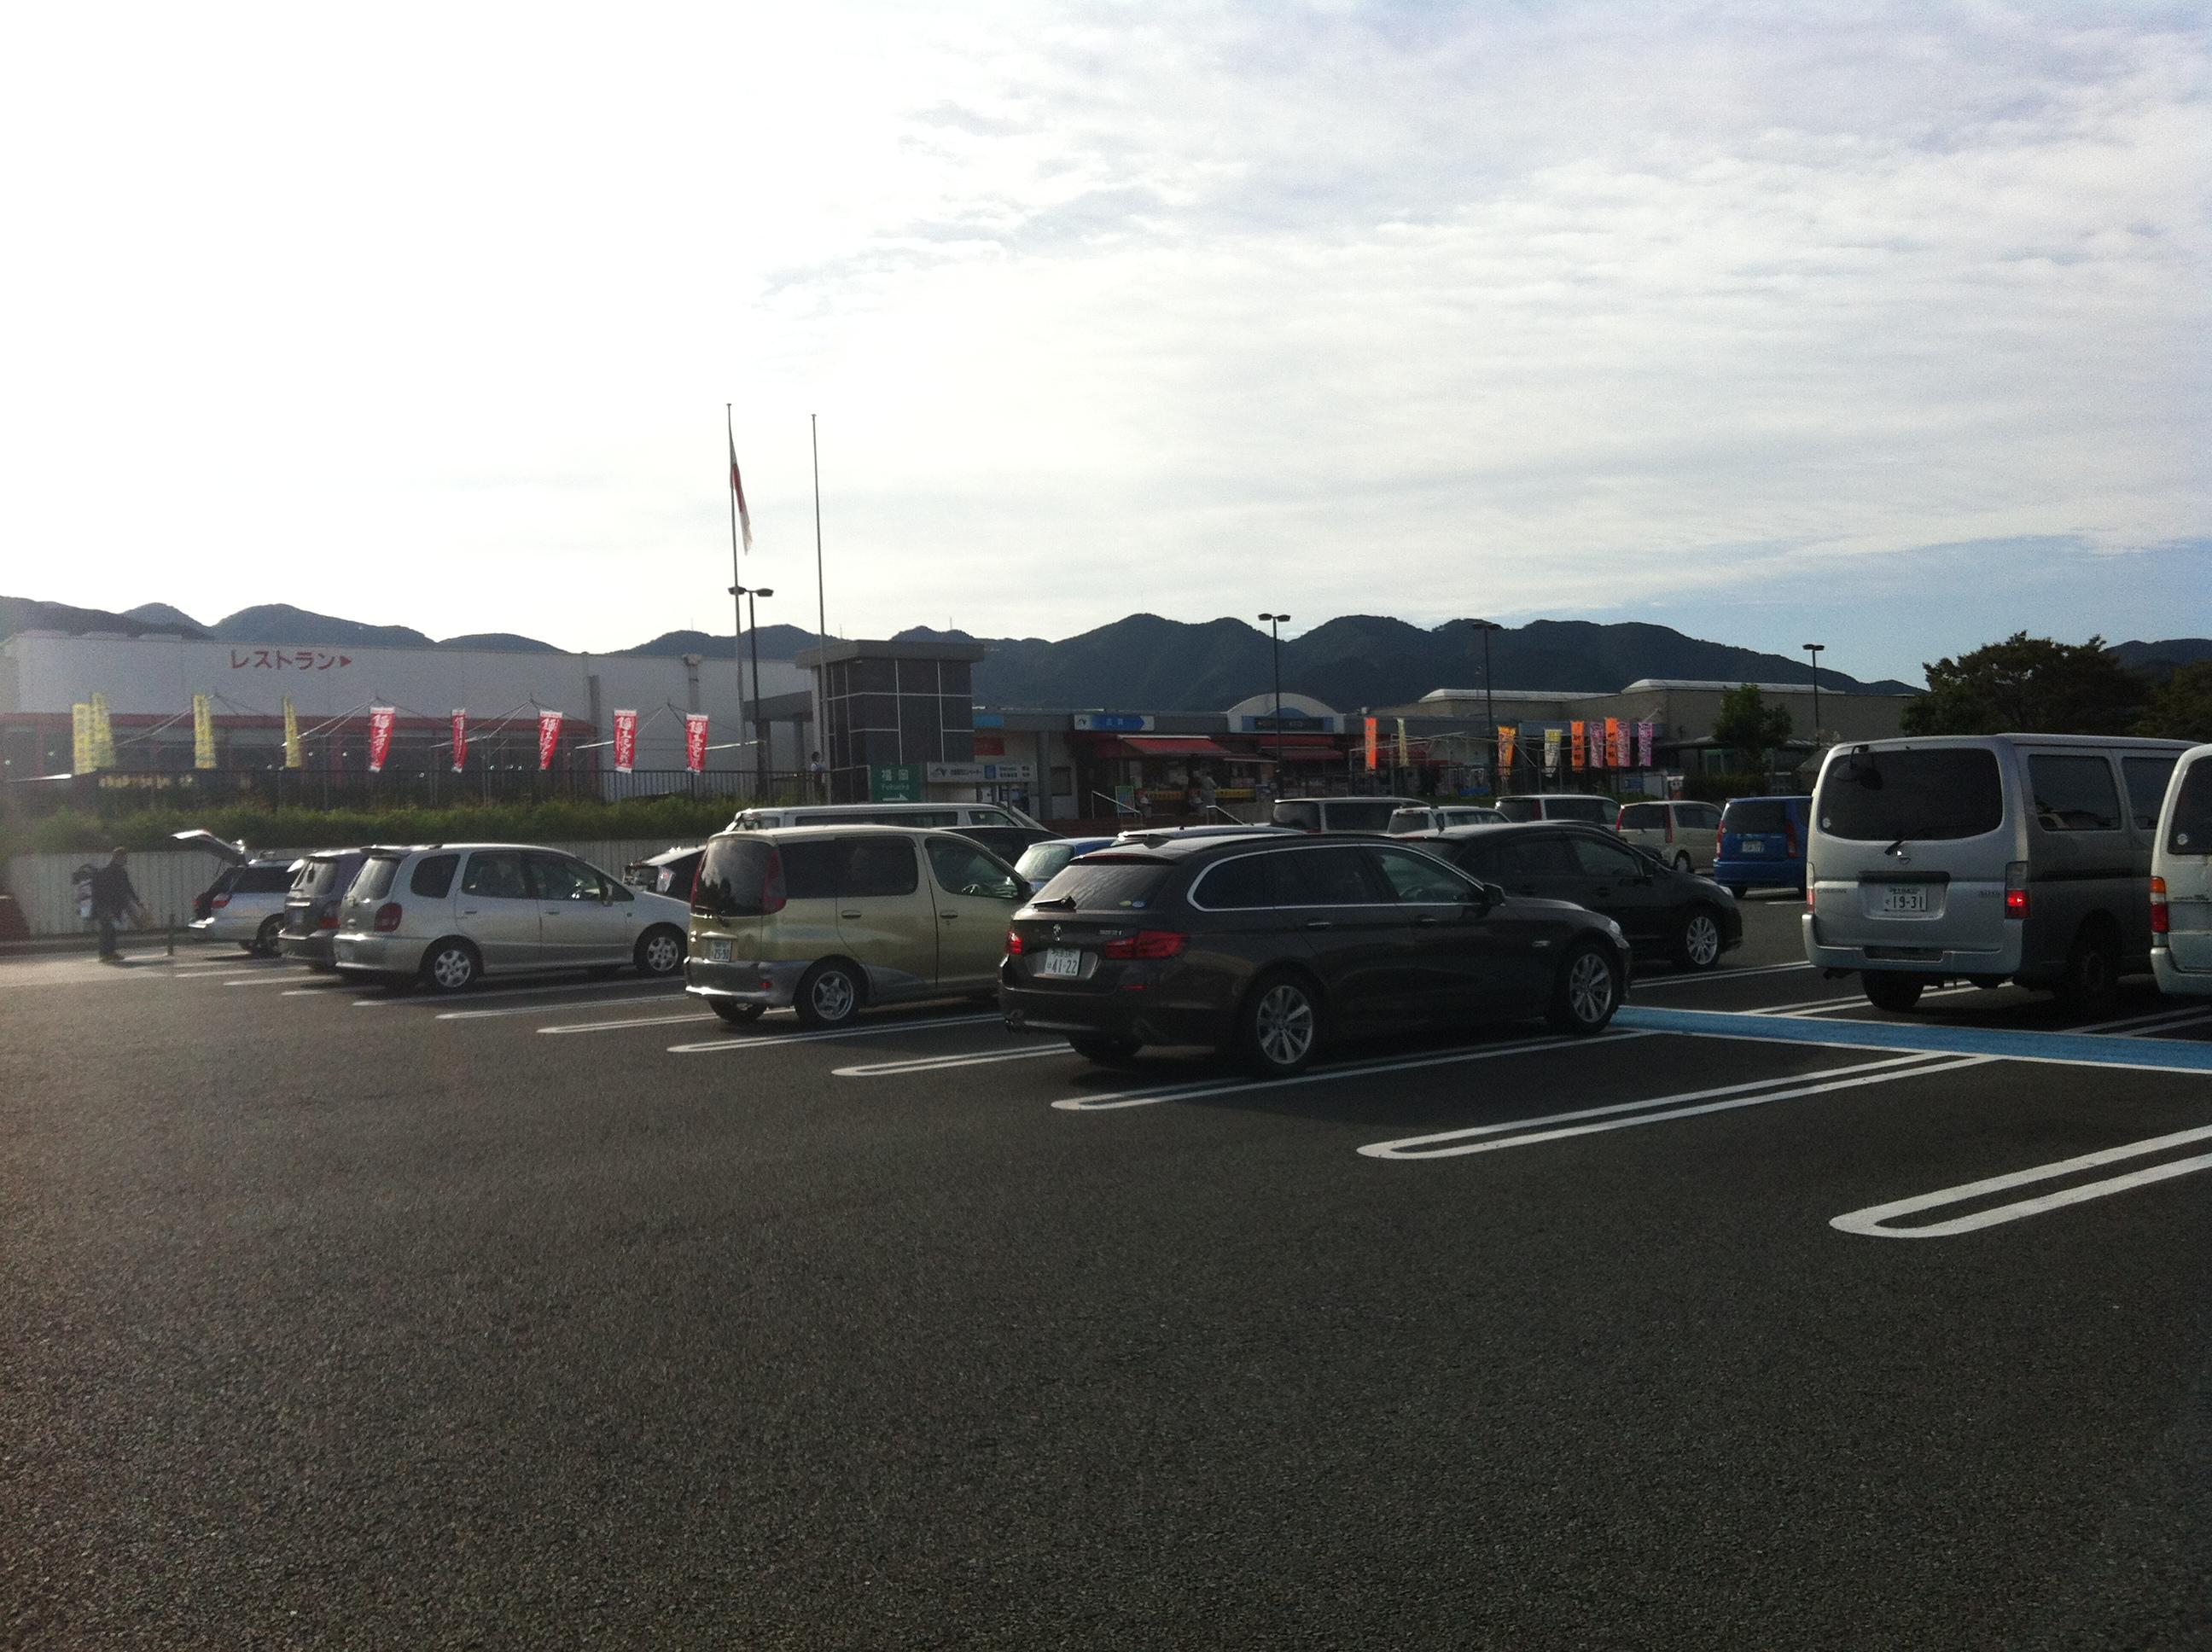 http://www.vantech.jp/shops/info/IMG_0363.JPG